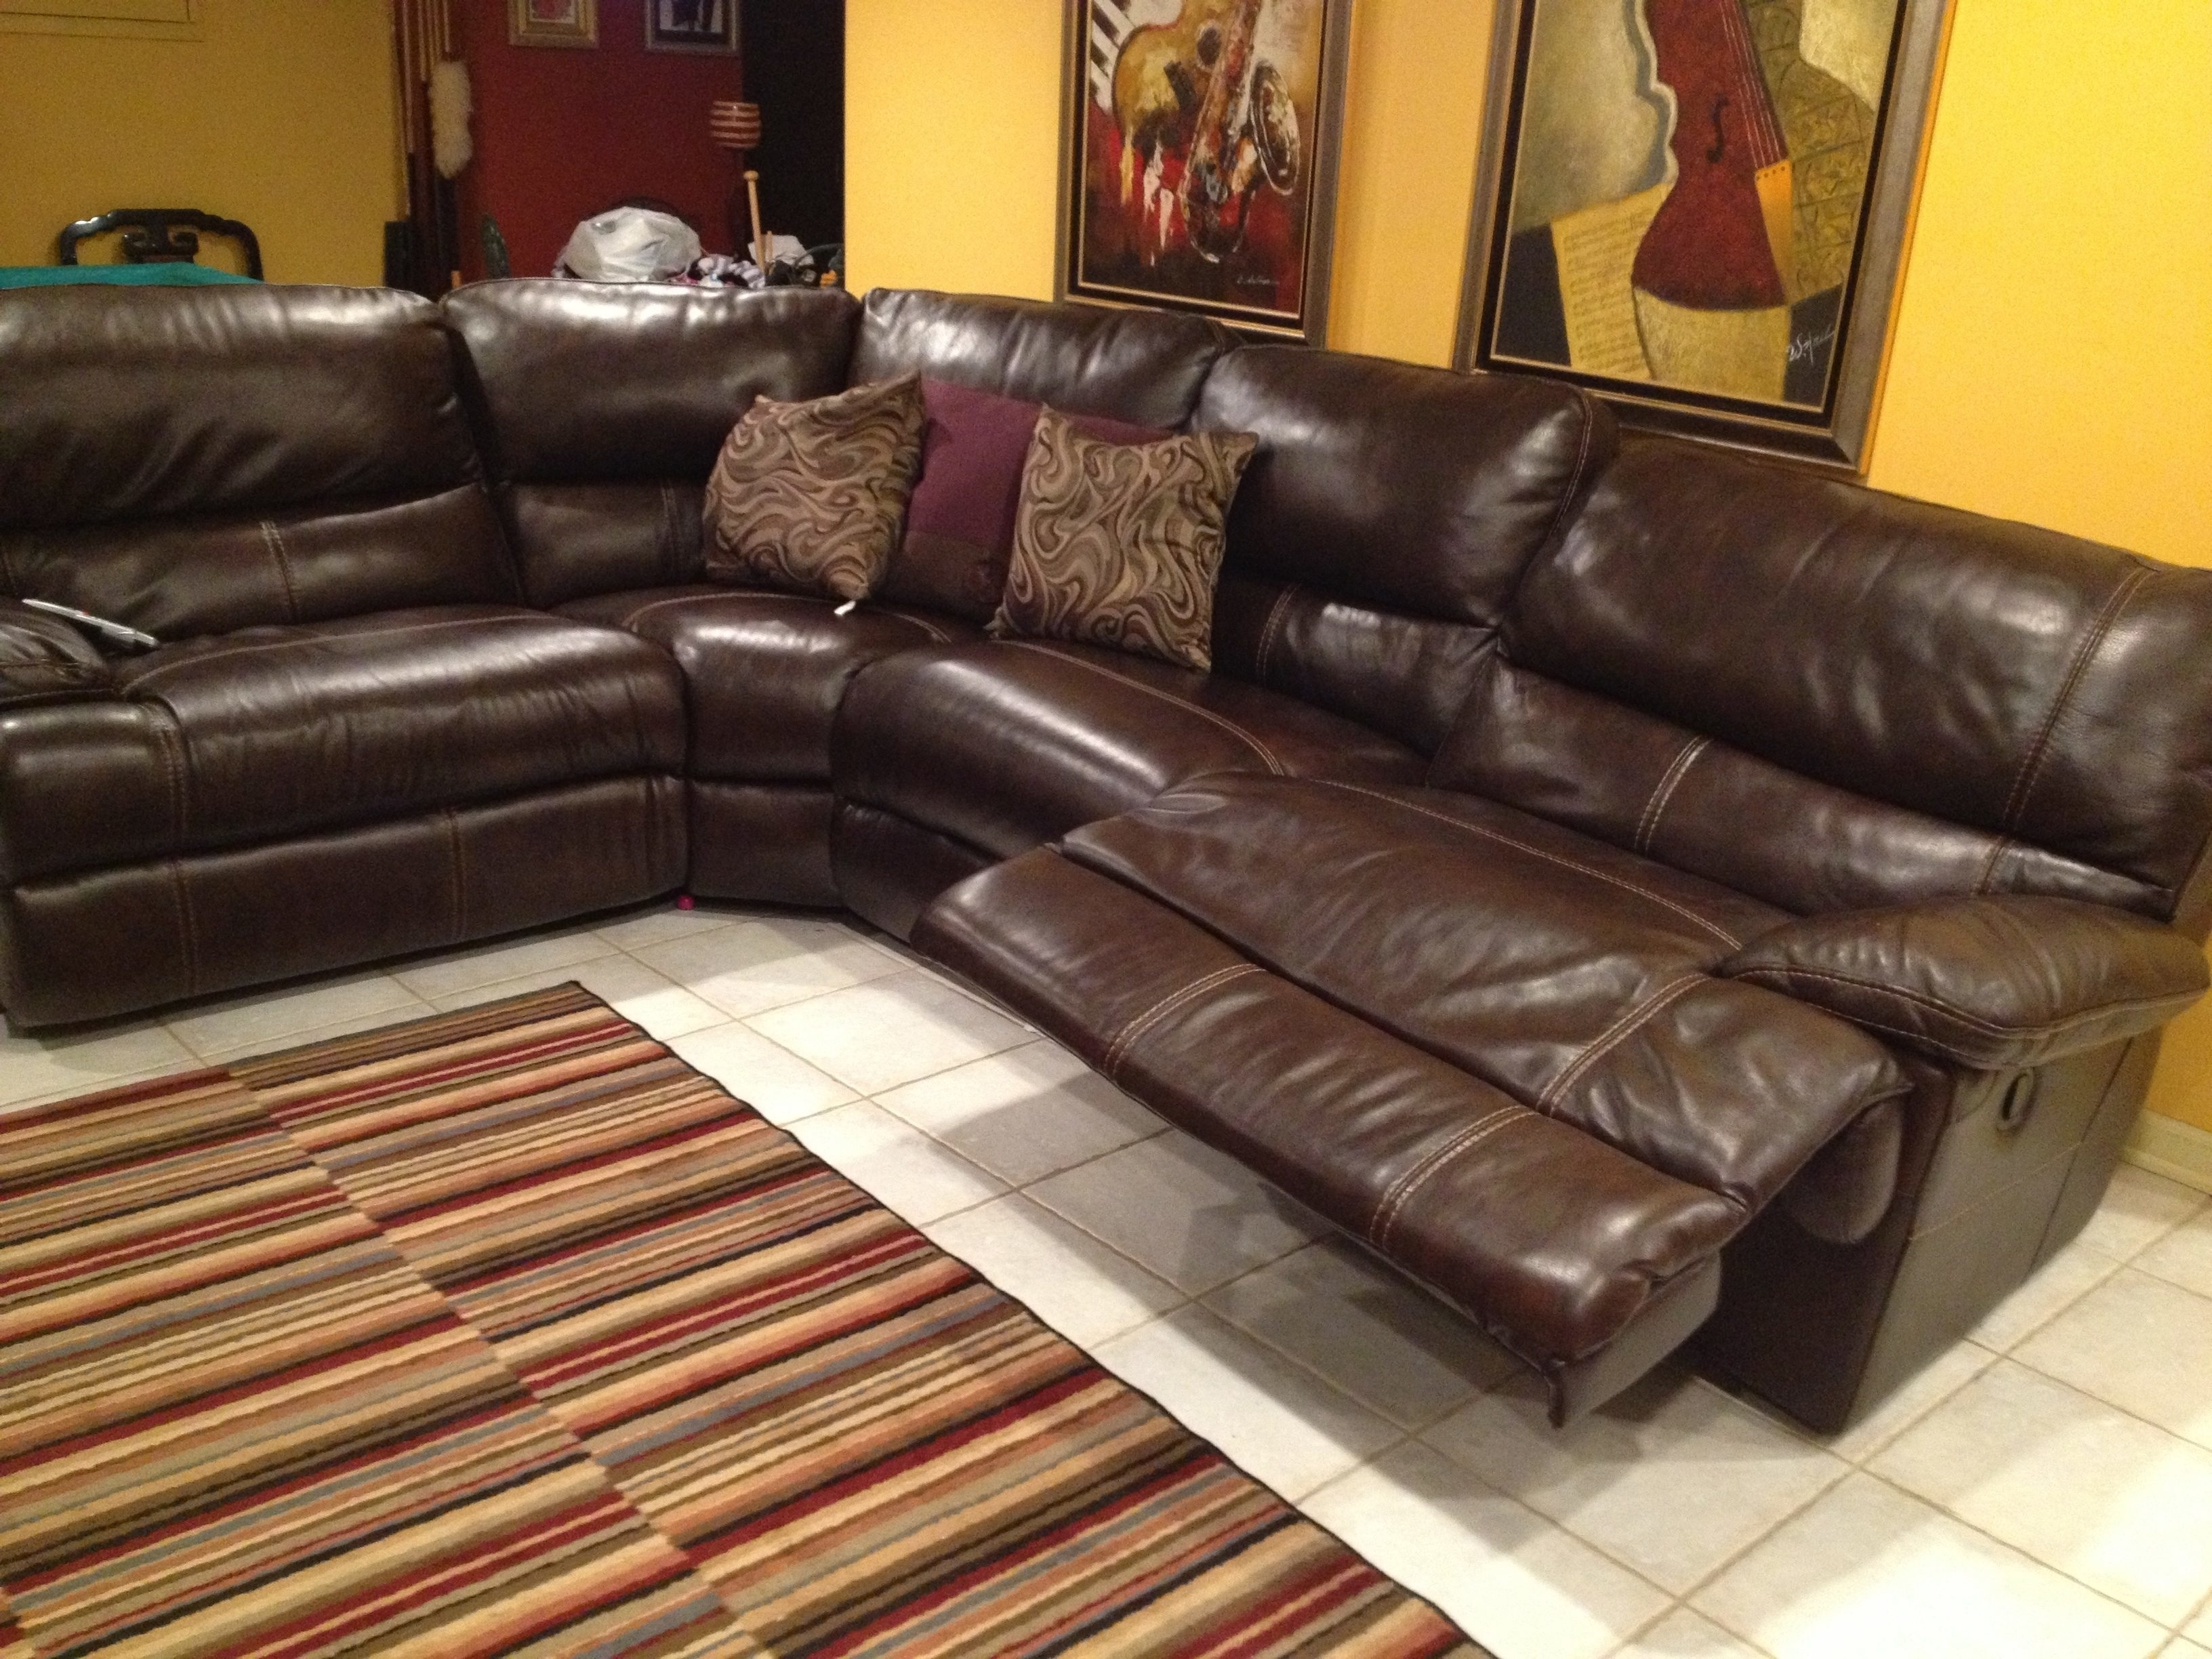 Bassett Dillon Sectional Sofa • Sectional Sofa in Sectional Sofas at Bassett (Image 3 of 15)